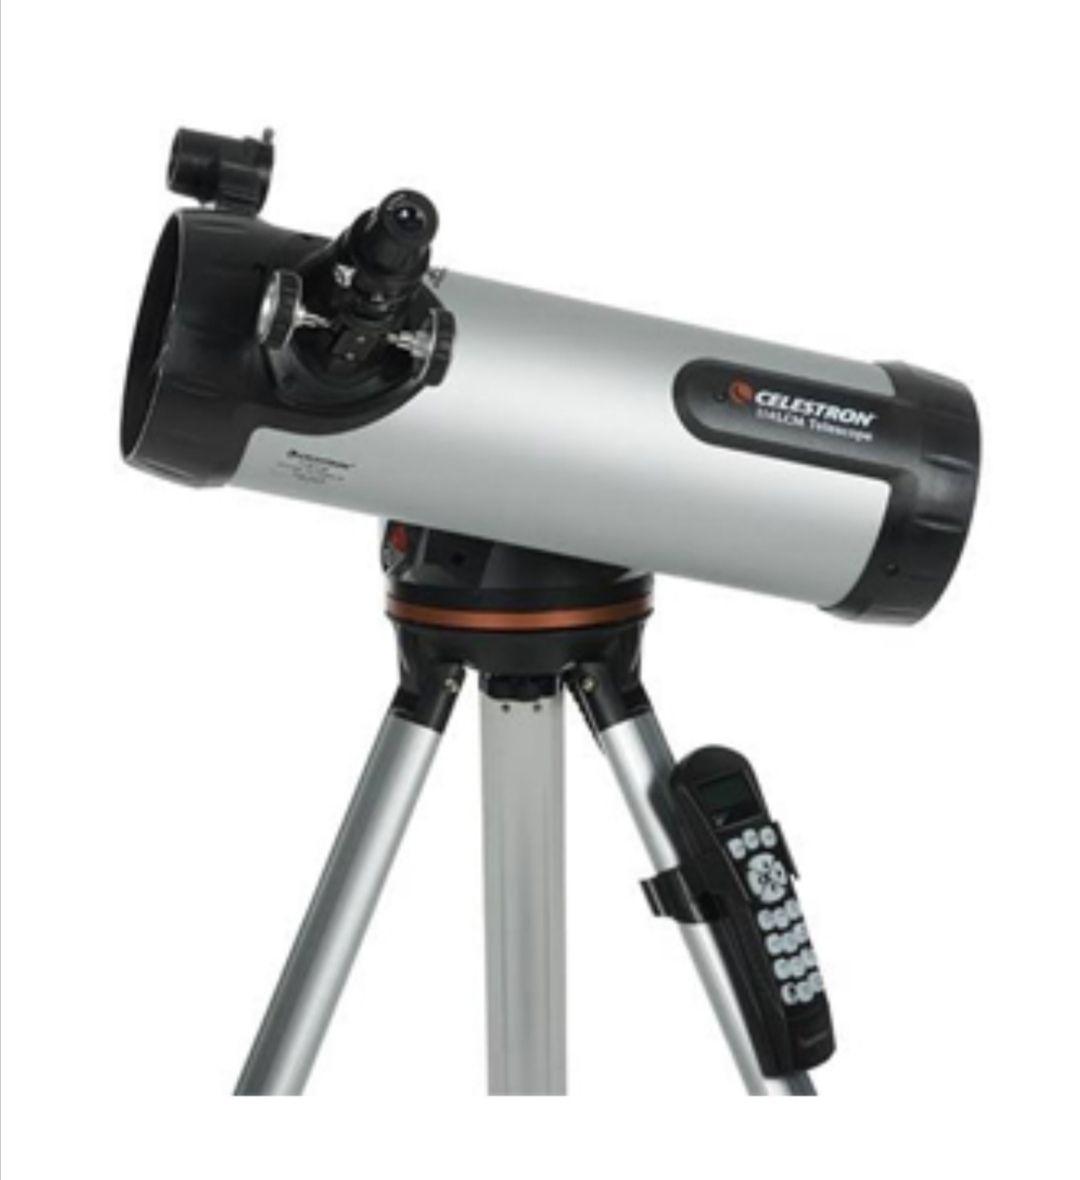 Celestron 114 LCM Computerised Newtonian Telescope £259 @ Bristol Cameras